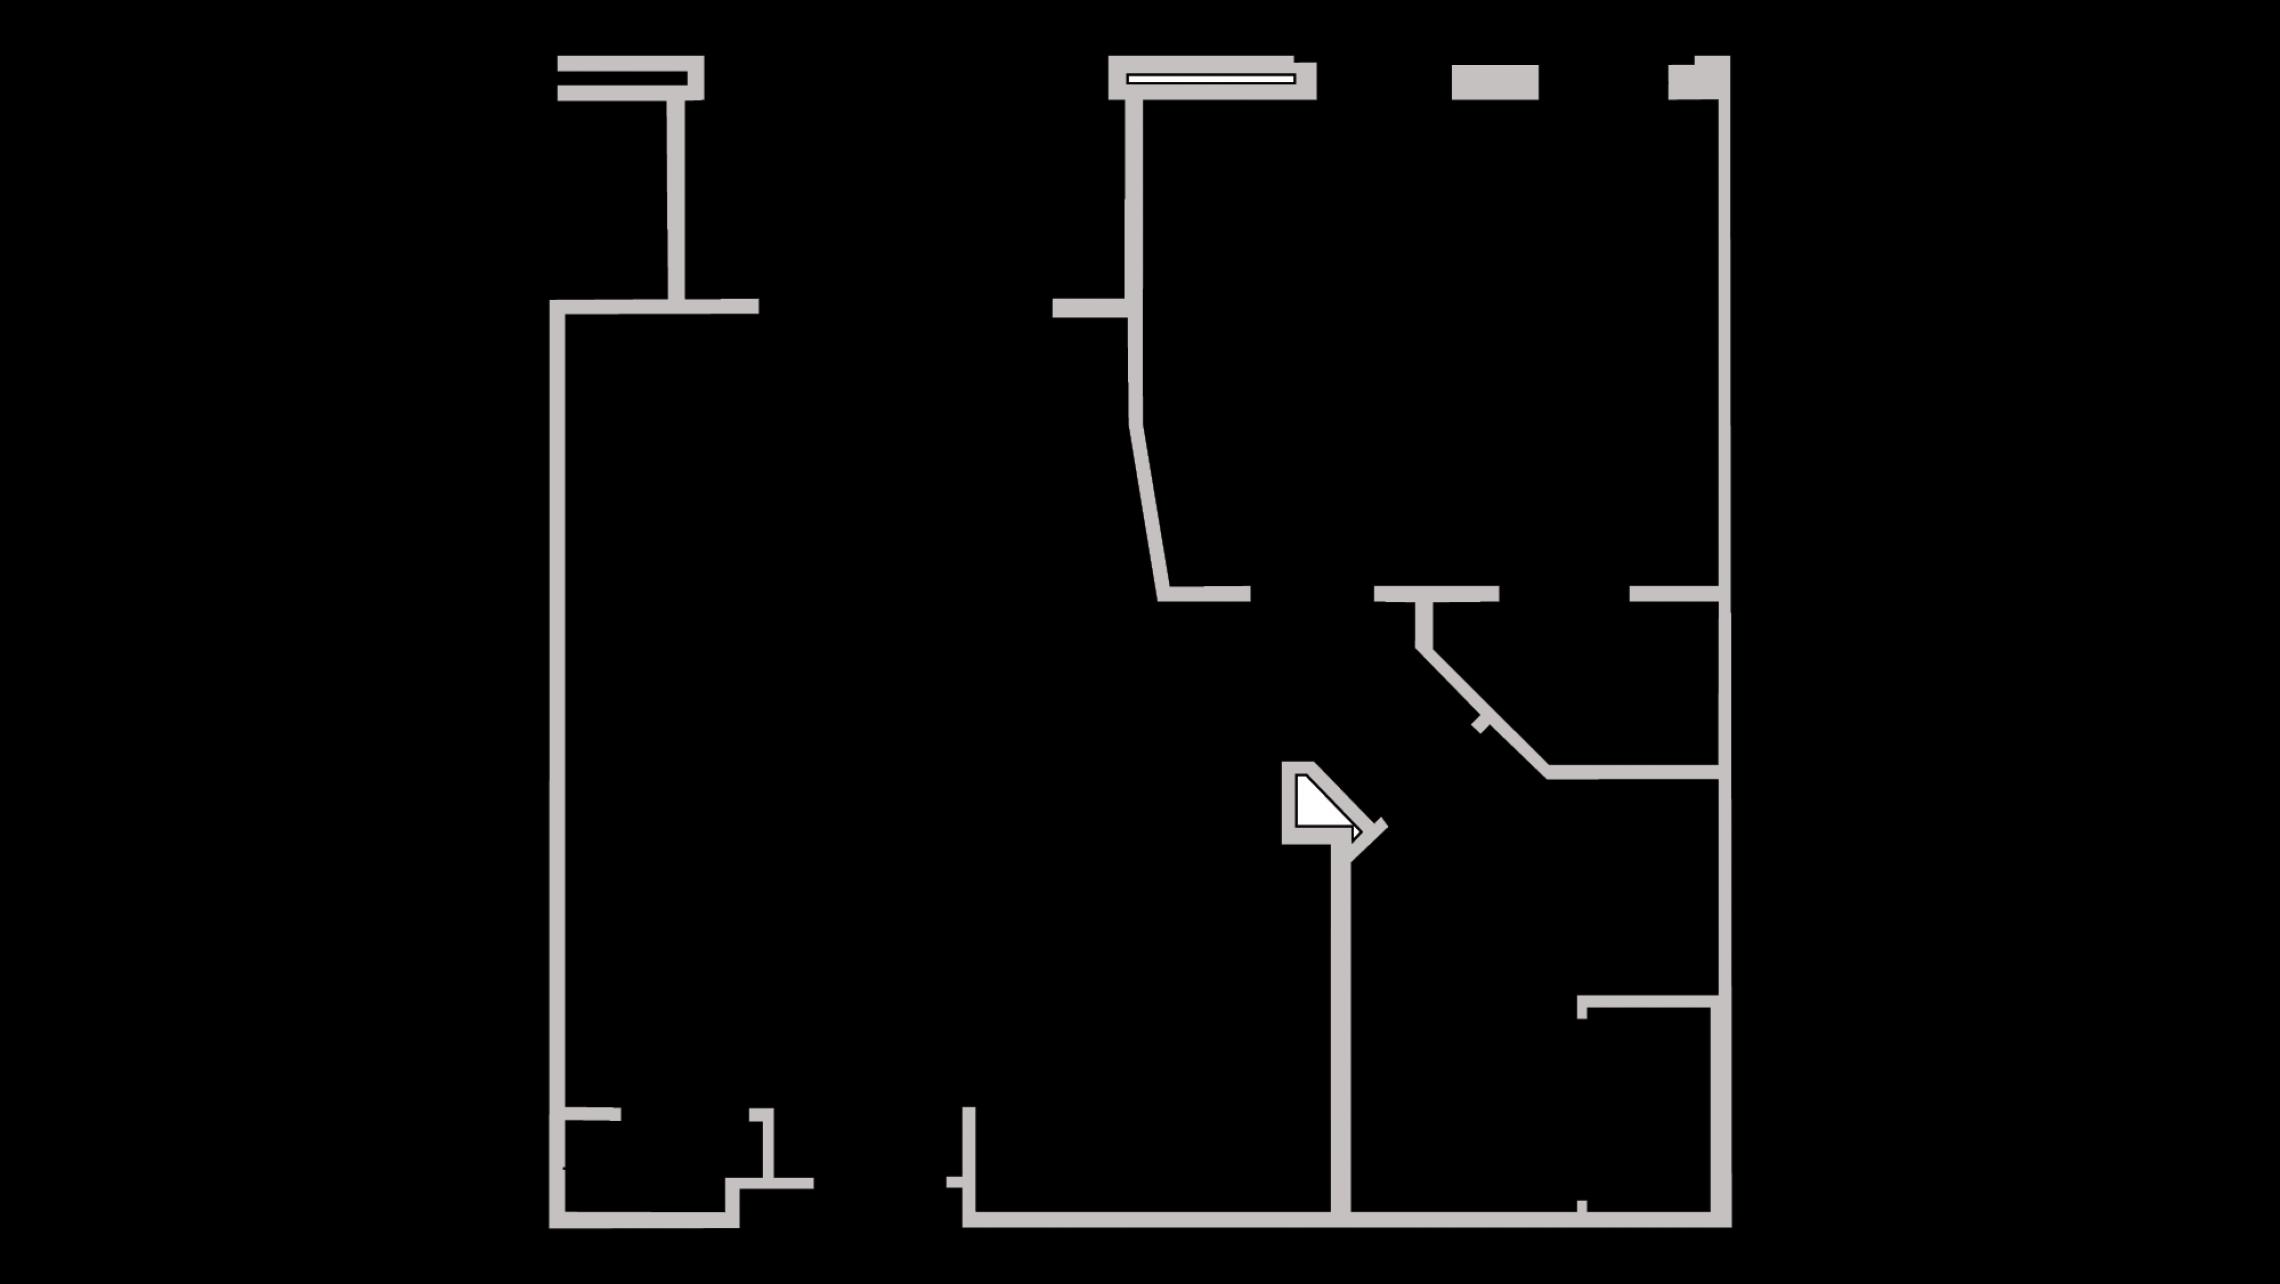 ULI The Depot 2-102 - One Bedroom, One Bathroom